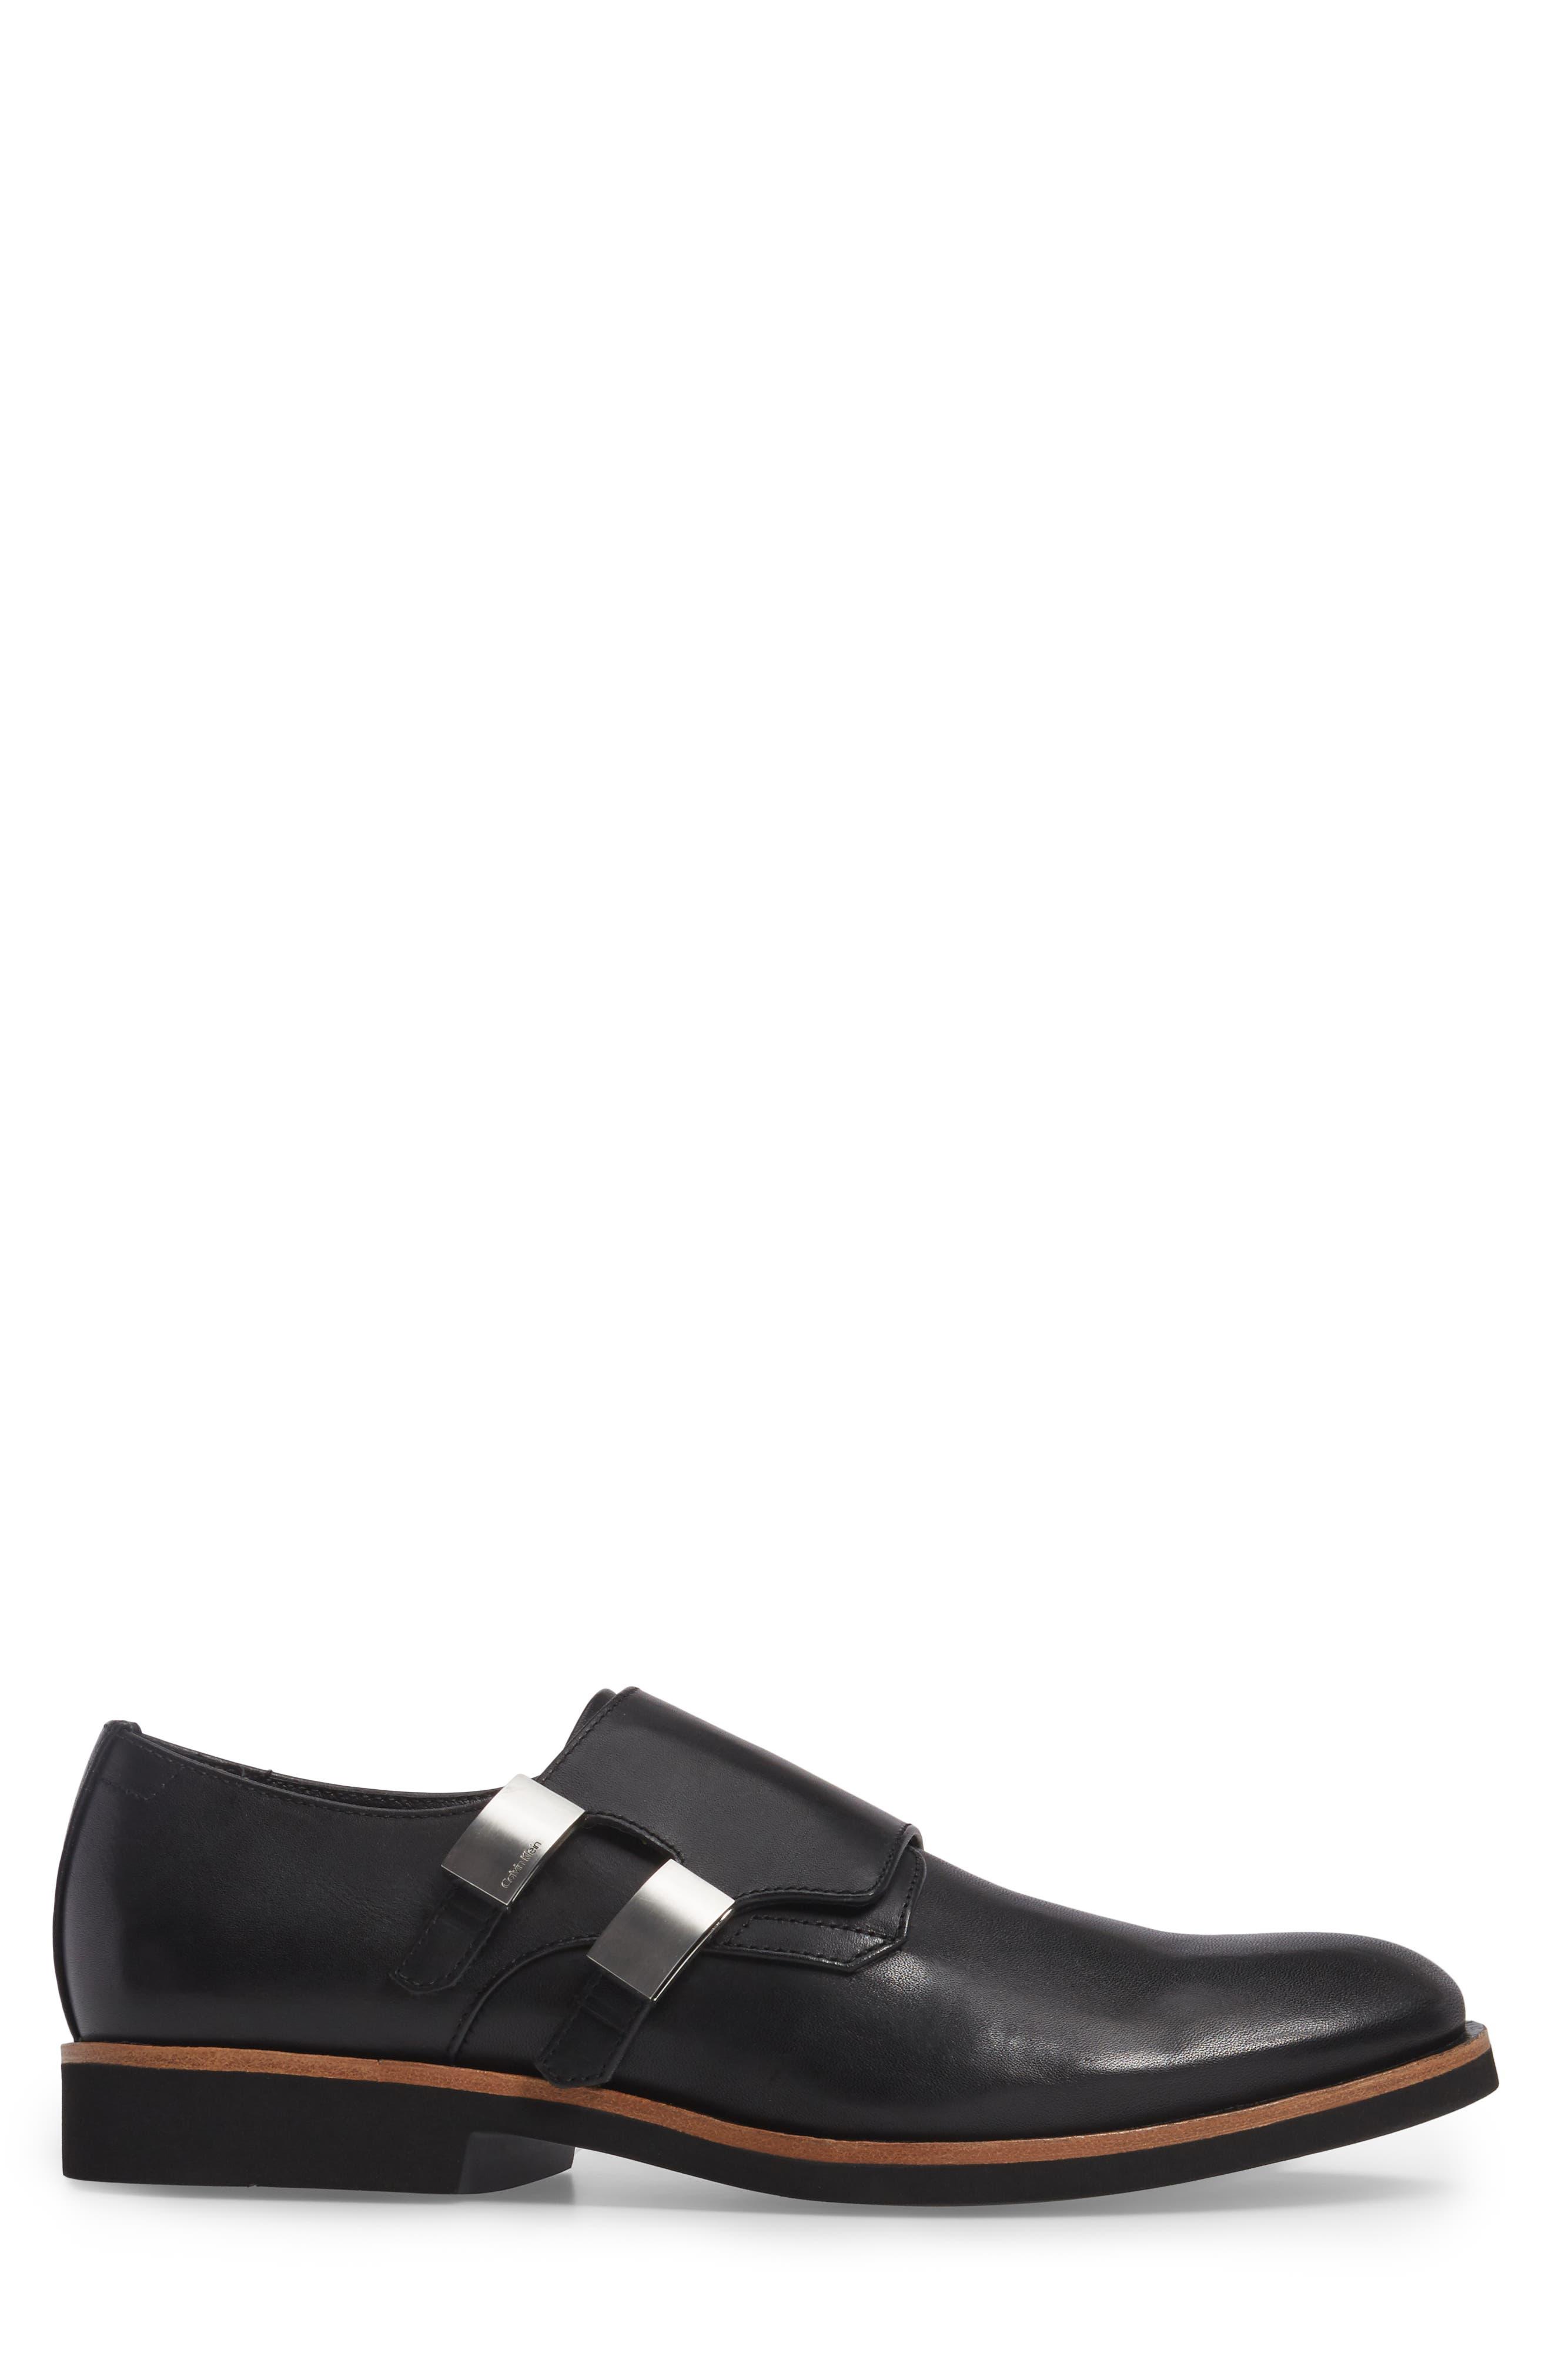 Finnegan Double Monk Strap Shoe,                             Alternate thumbnail 3, color,                             Black Leather